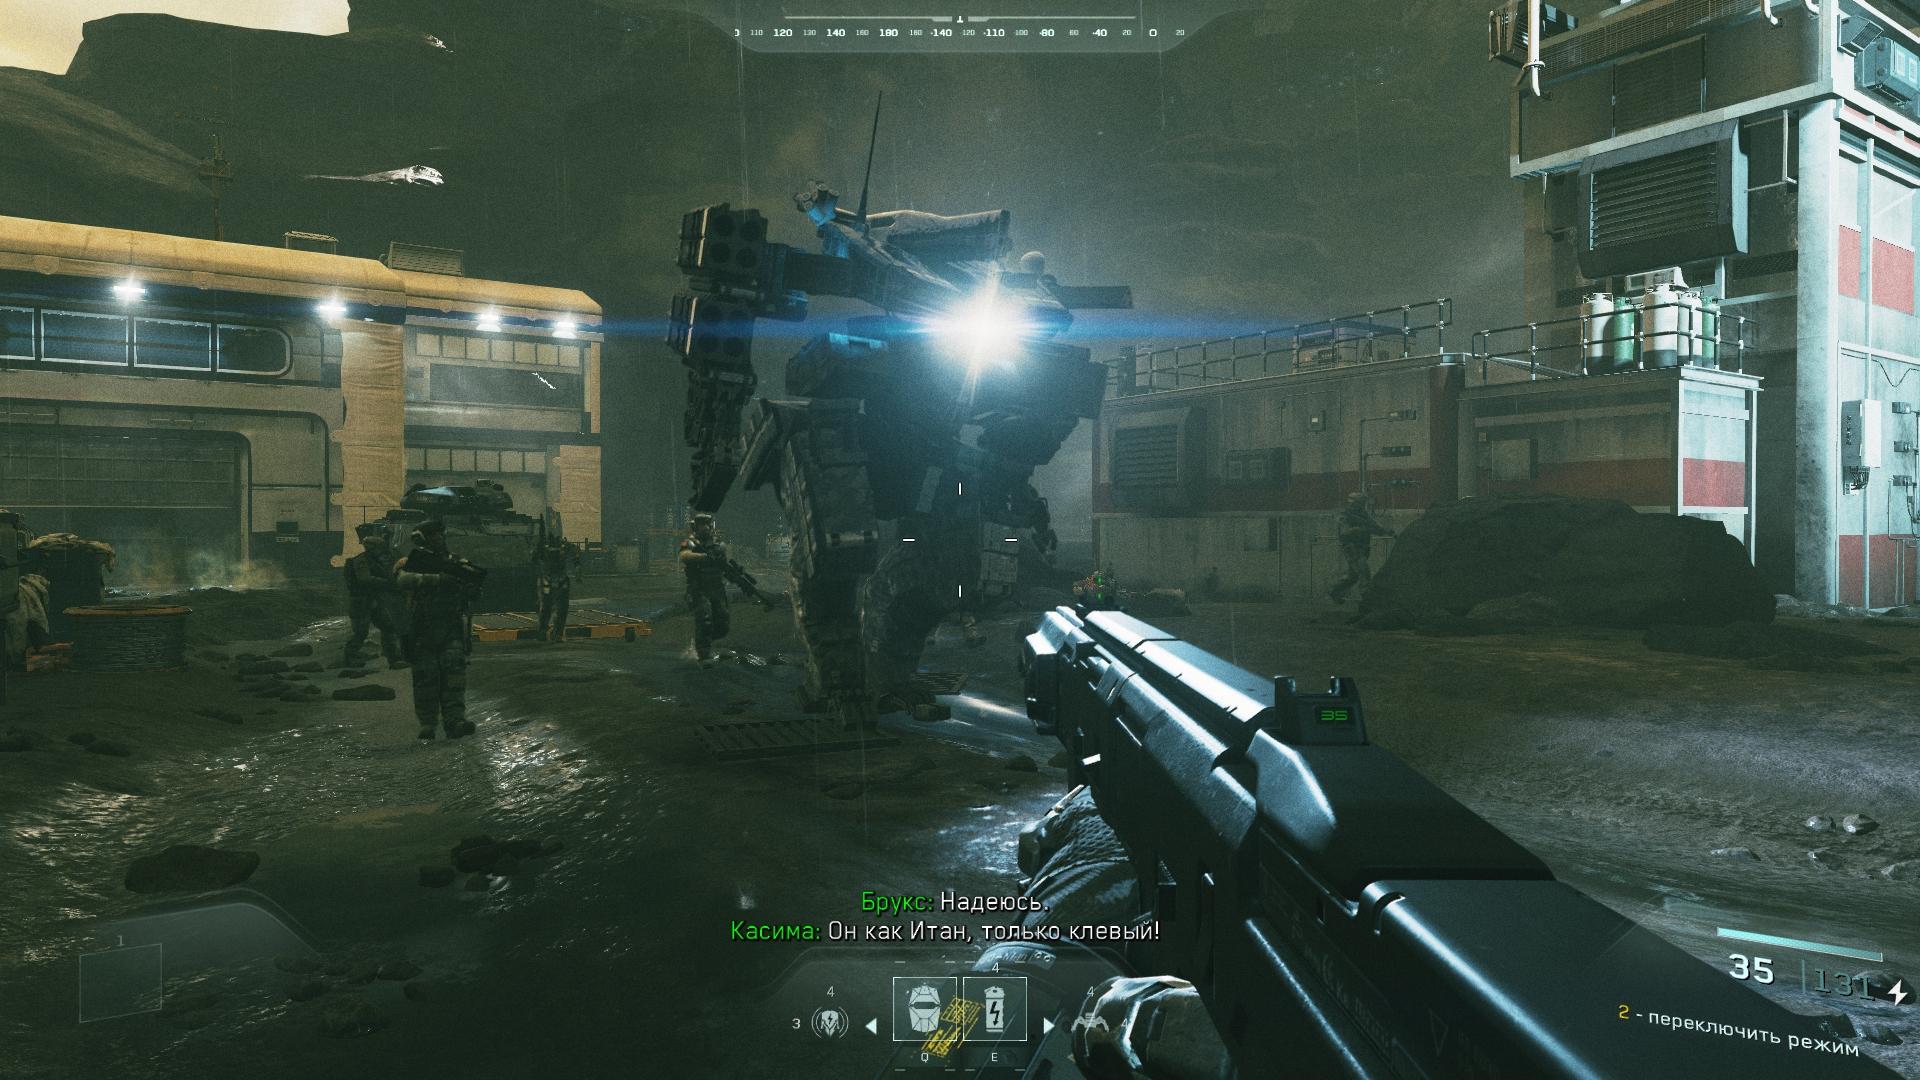 00084.Jpg - Call of Duty: Infinite Warfare